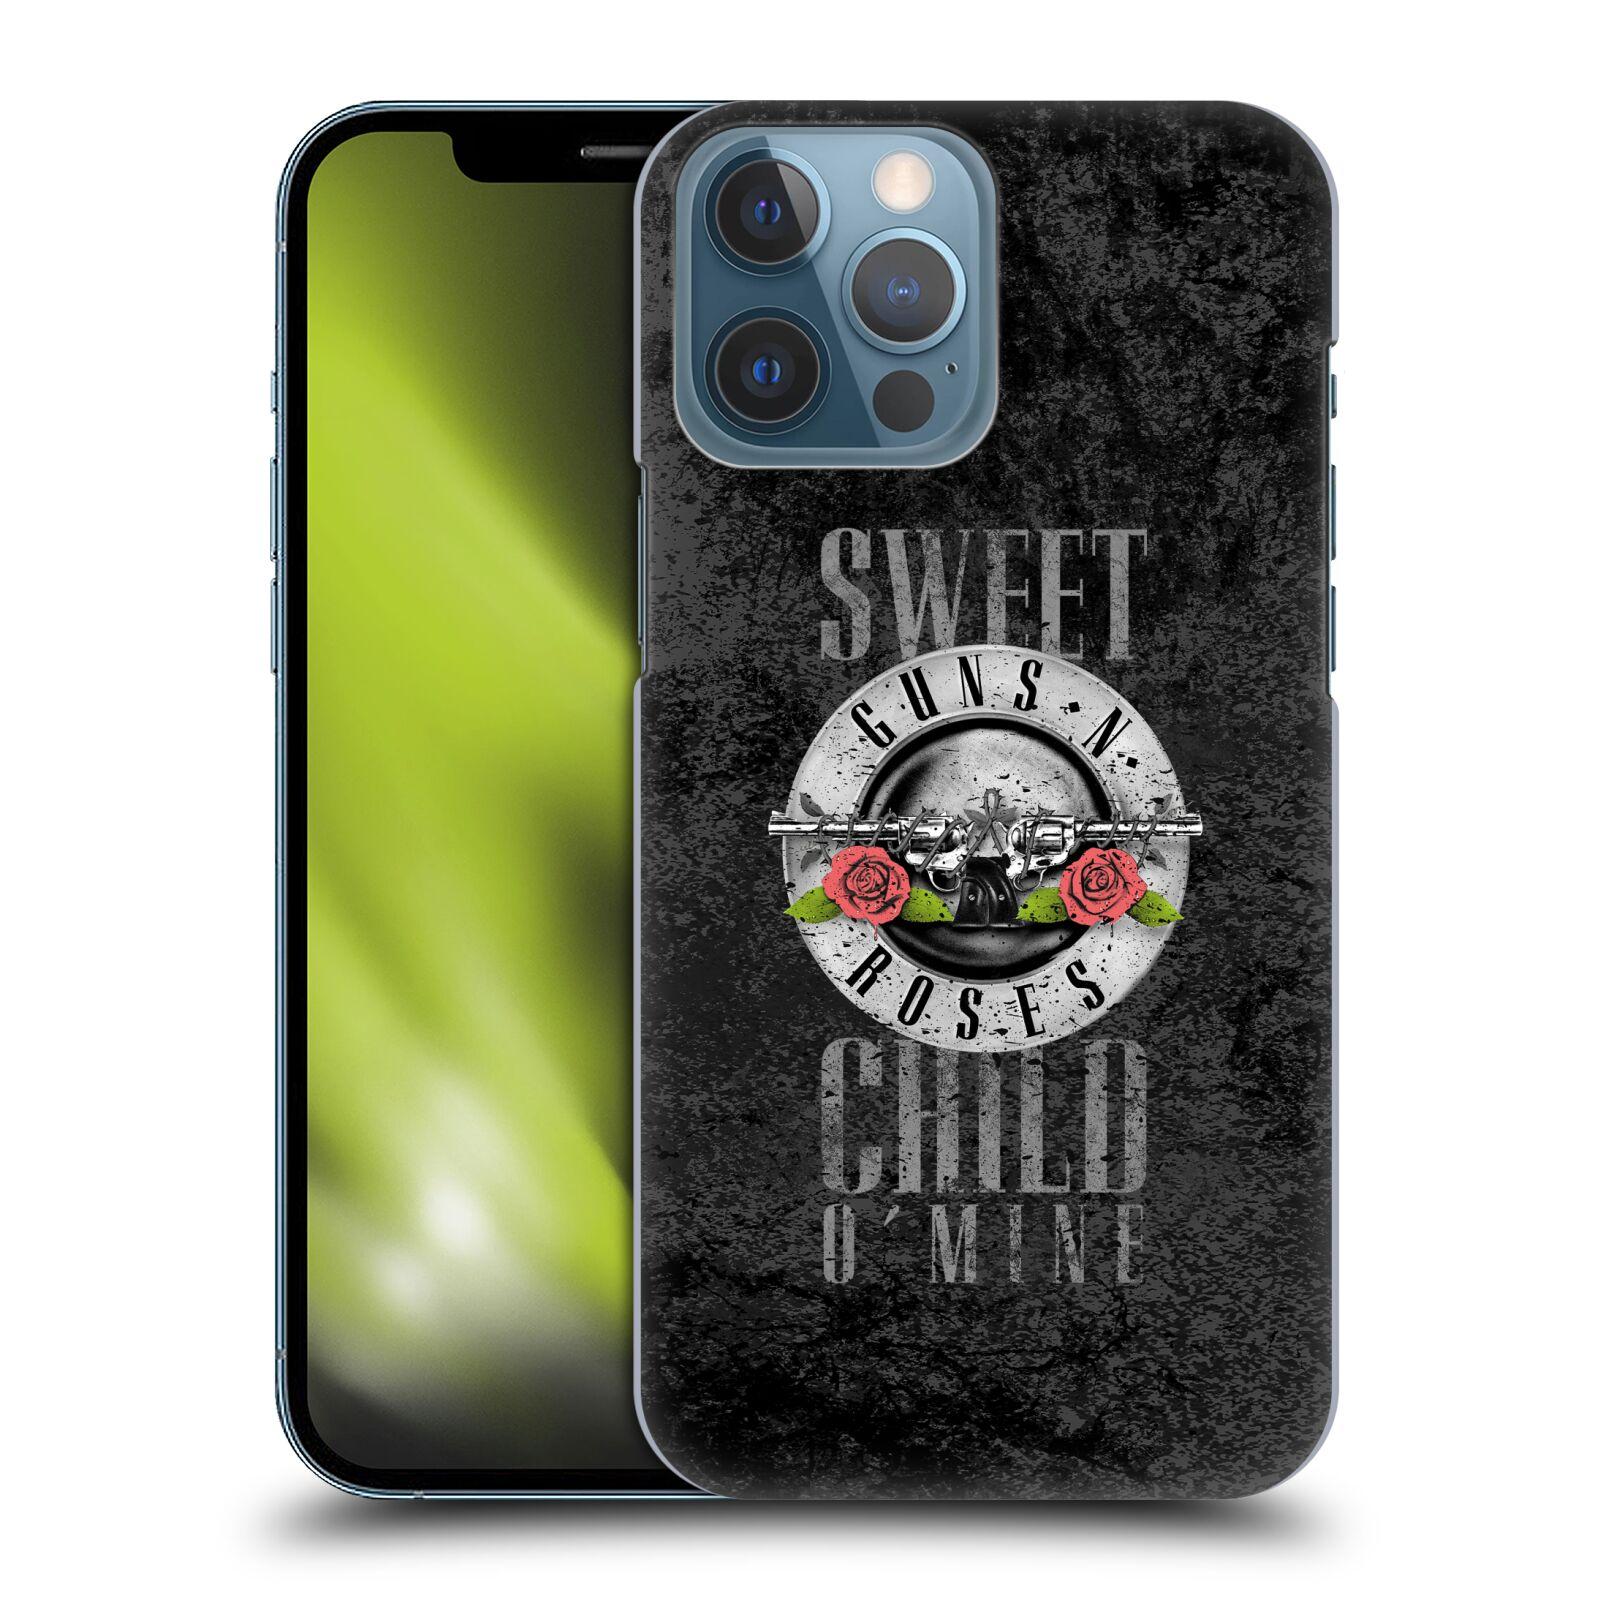 Plastové pouzdro na mobil Apple iPhone 13 Pro Max - Head Case - Guns N' Roses - Sweet Child